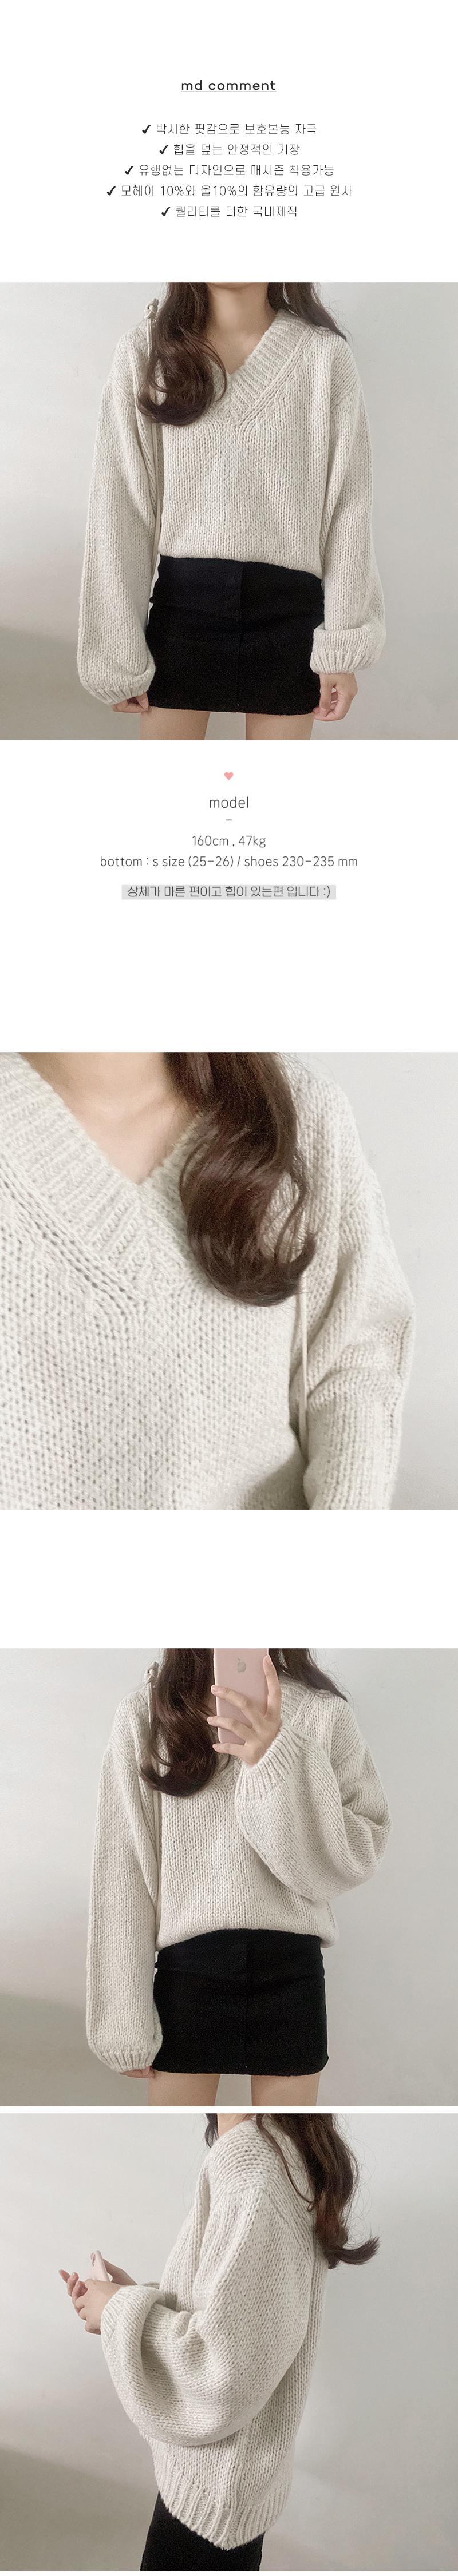 Loner V-Neck Loose Knitwear